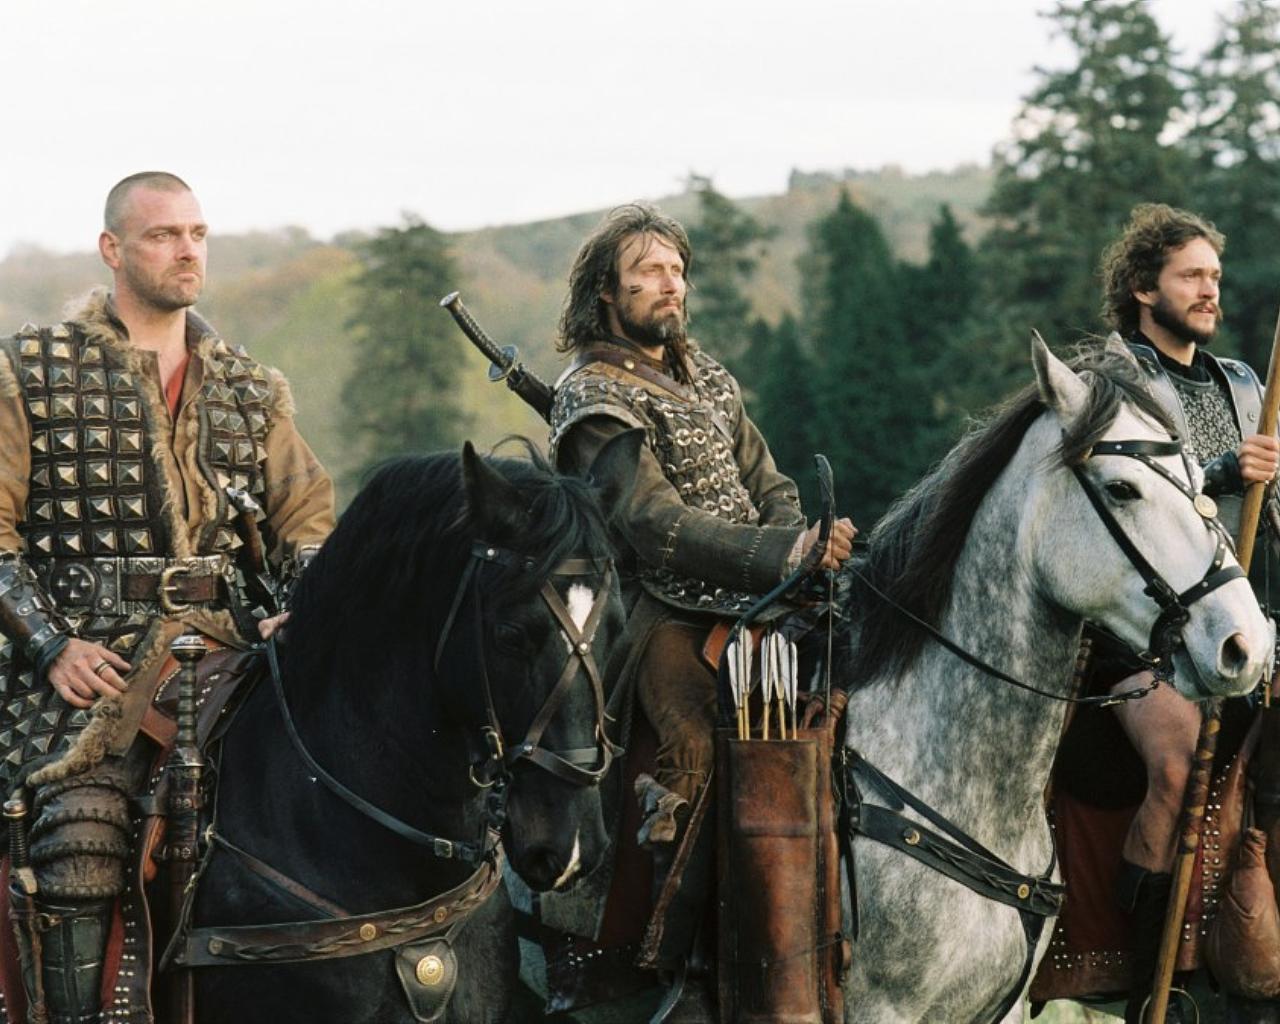 King Arthur - Dagonet, Tristan, and Galahad